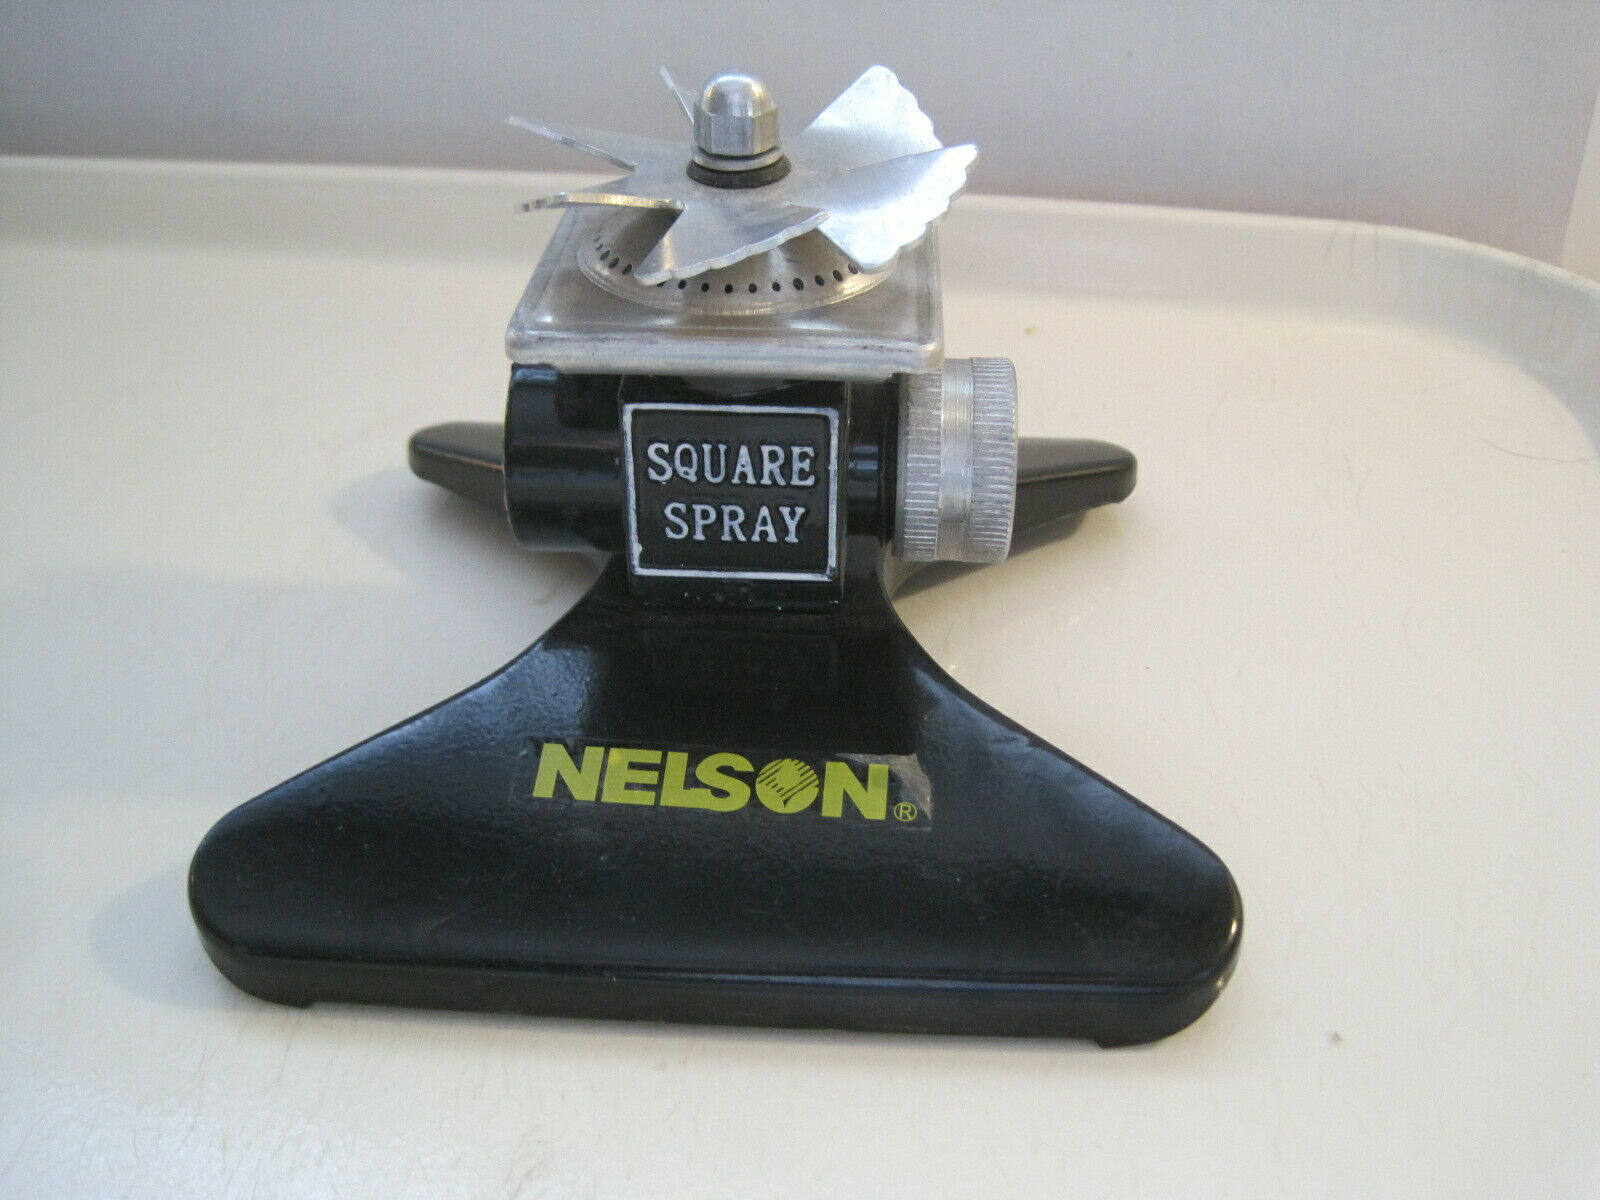 Nelson Square Spray Hose Sprinkler Lawn Garden It Gets the Corners Metal Black